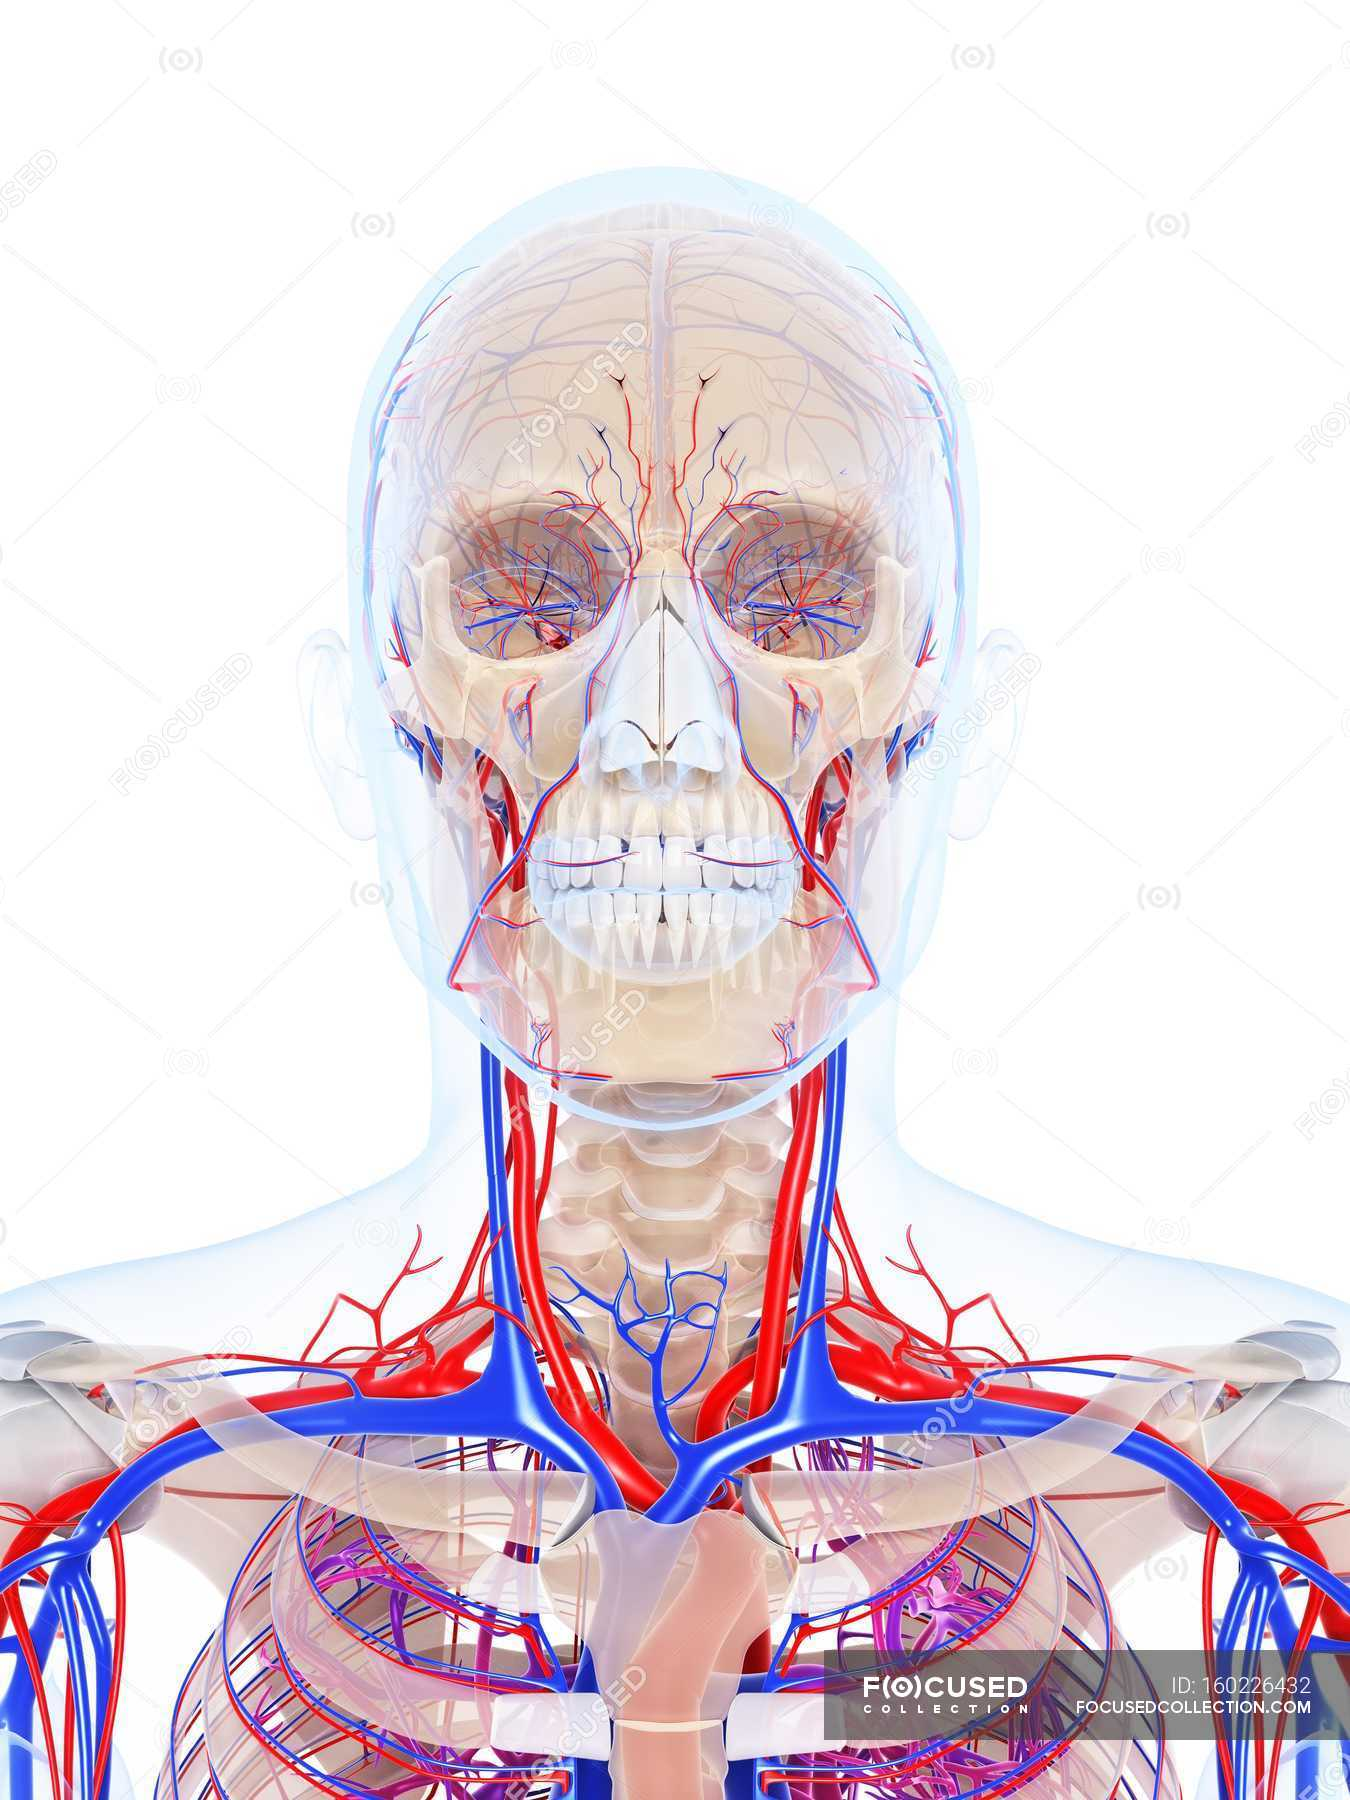 Male vascular system — Stock Photo | #160226432